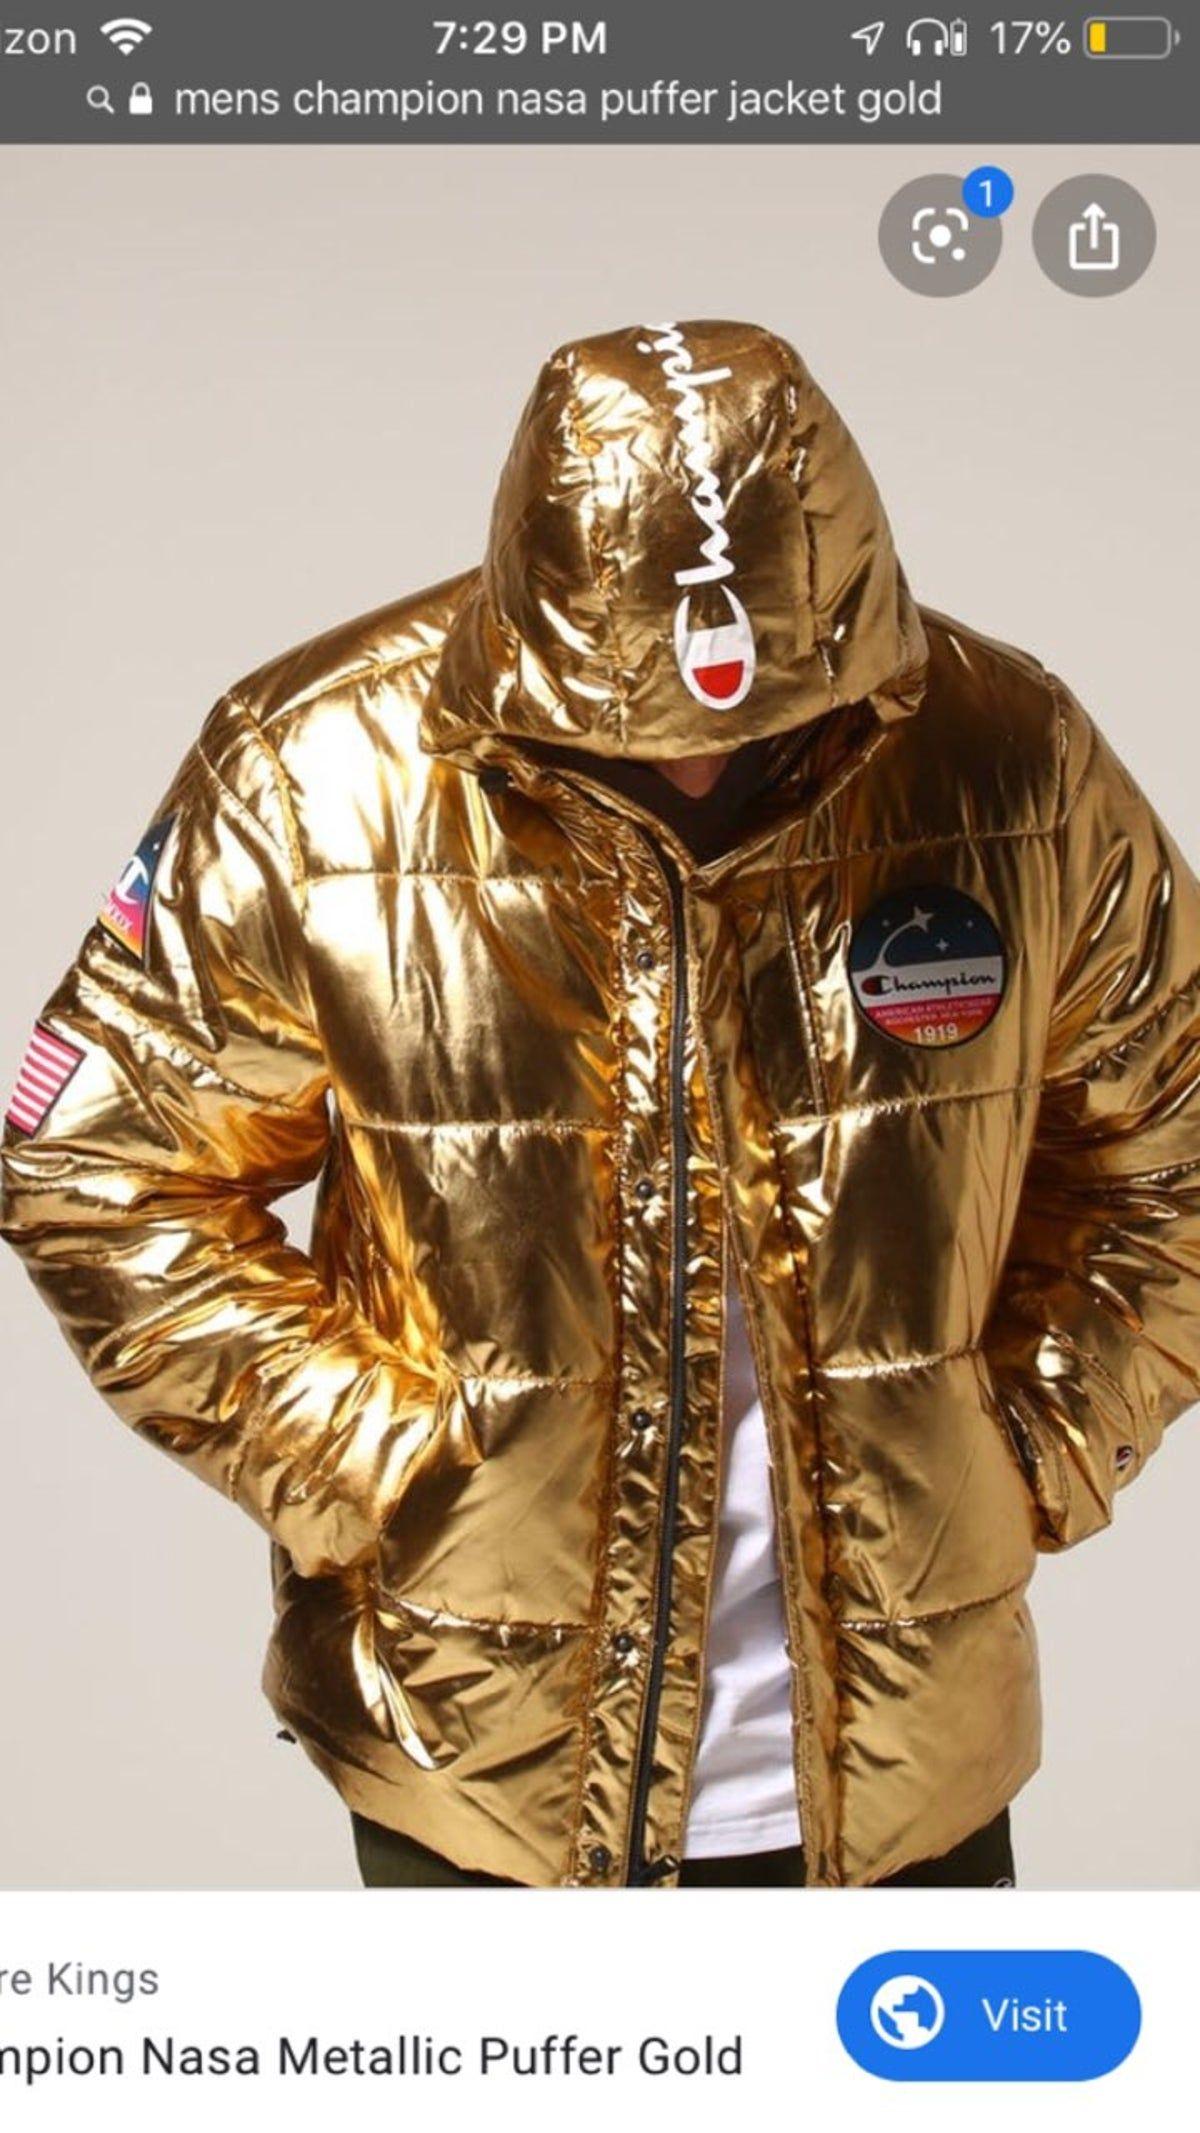 Pin By Viktoriya Florchuk On Zolotij Bomber Mens Gold Puffer Jackets Motorcycle Jacket [ 2133 x 1200 Pixel ]